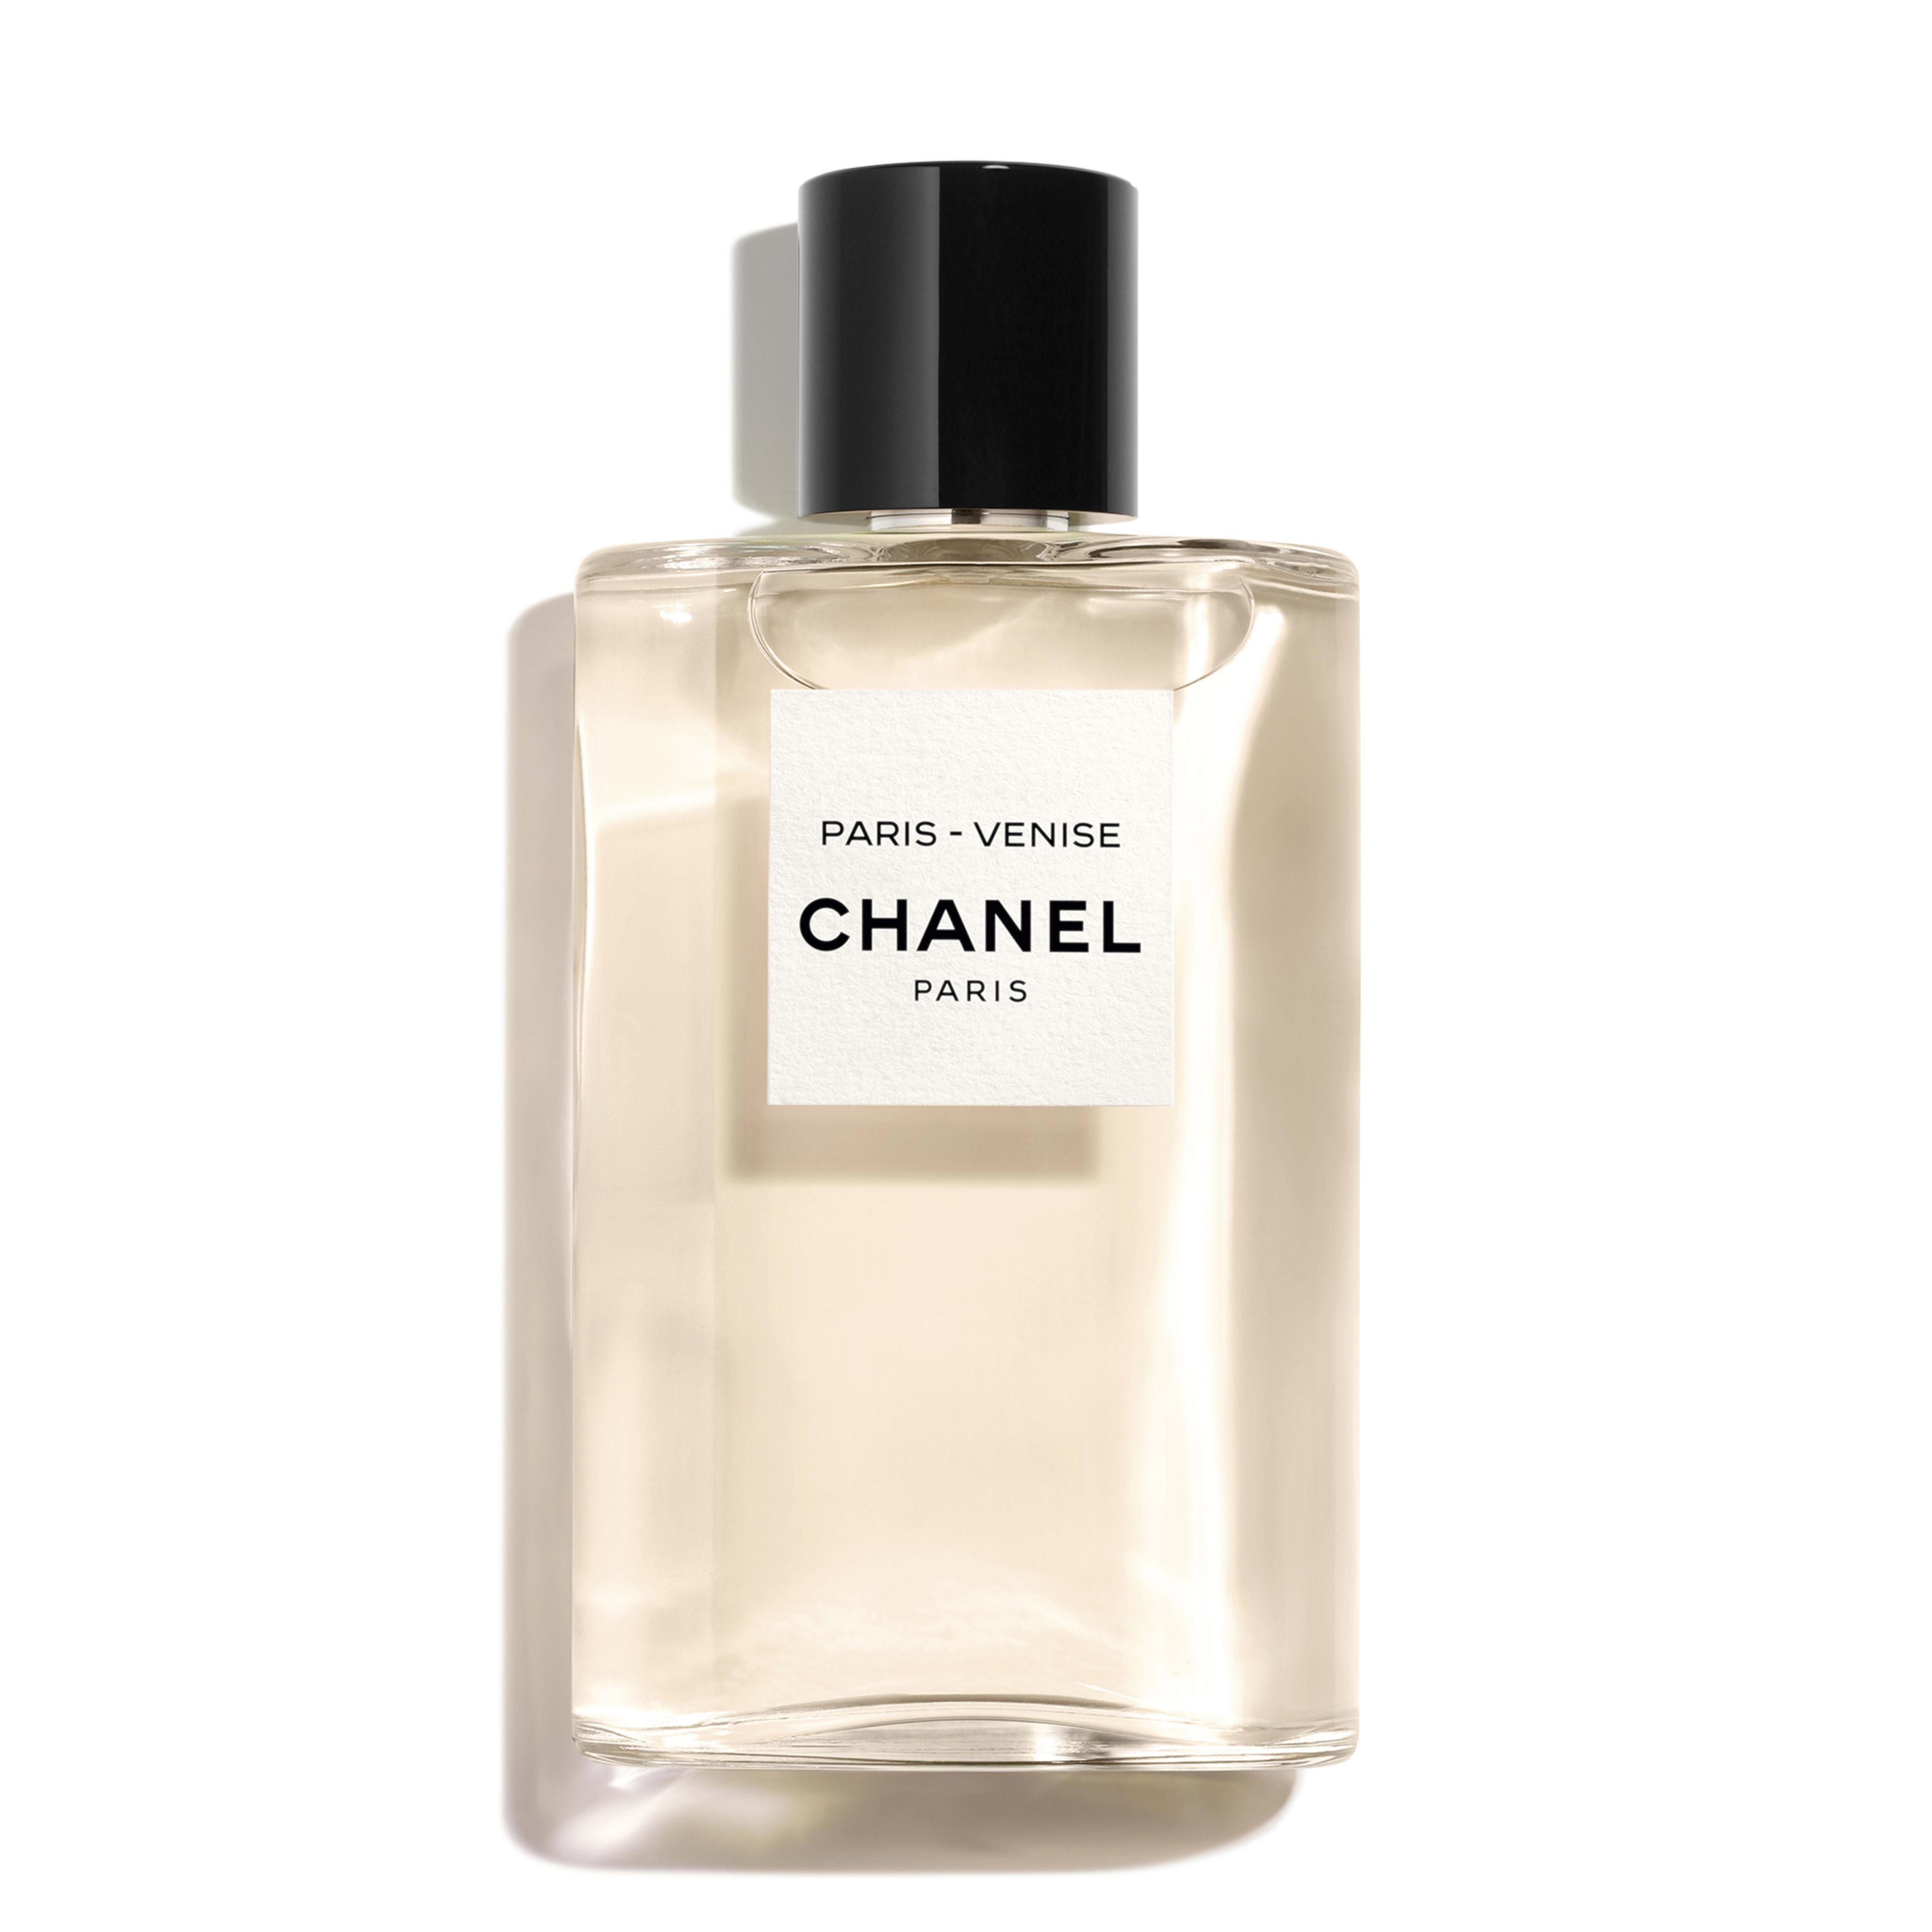 PARIS - VENISE - fragrance - 125ml - Вид по умолчанию